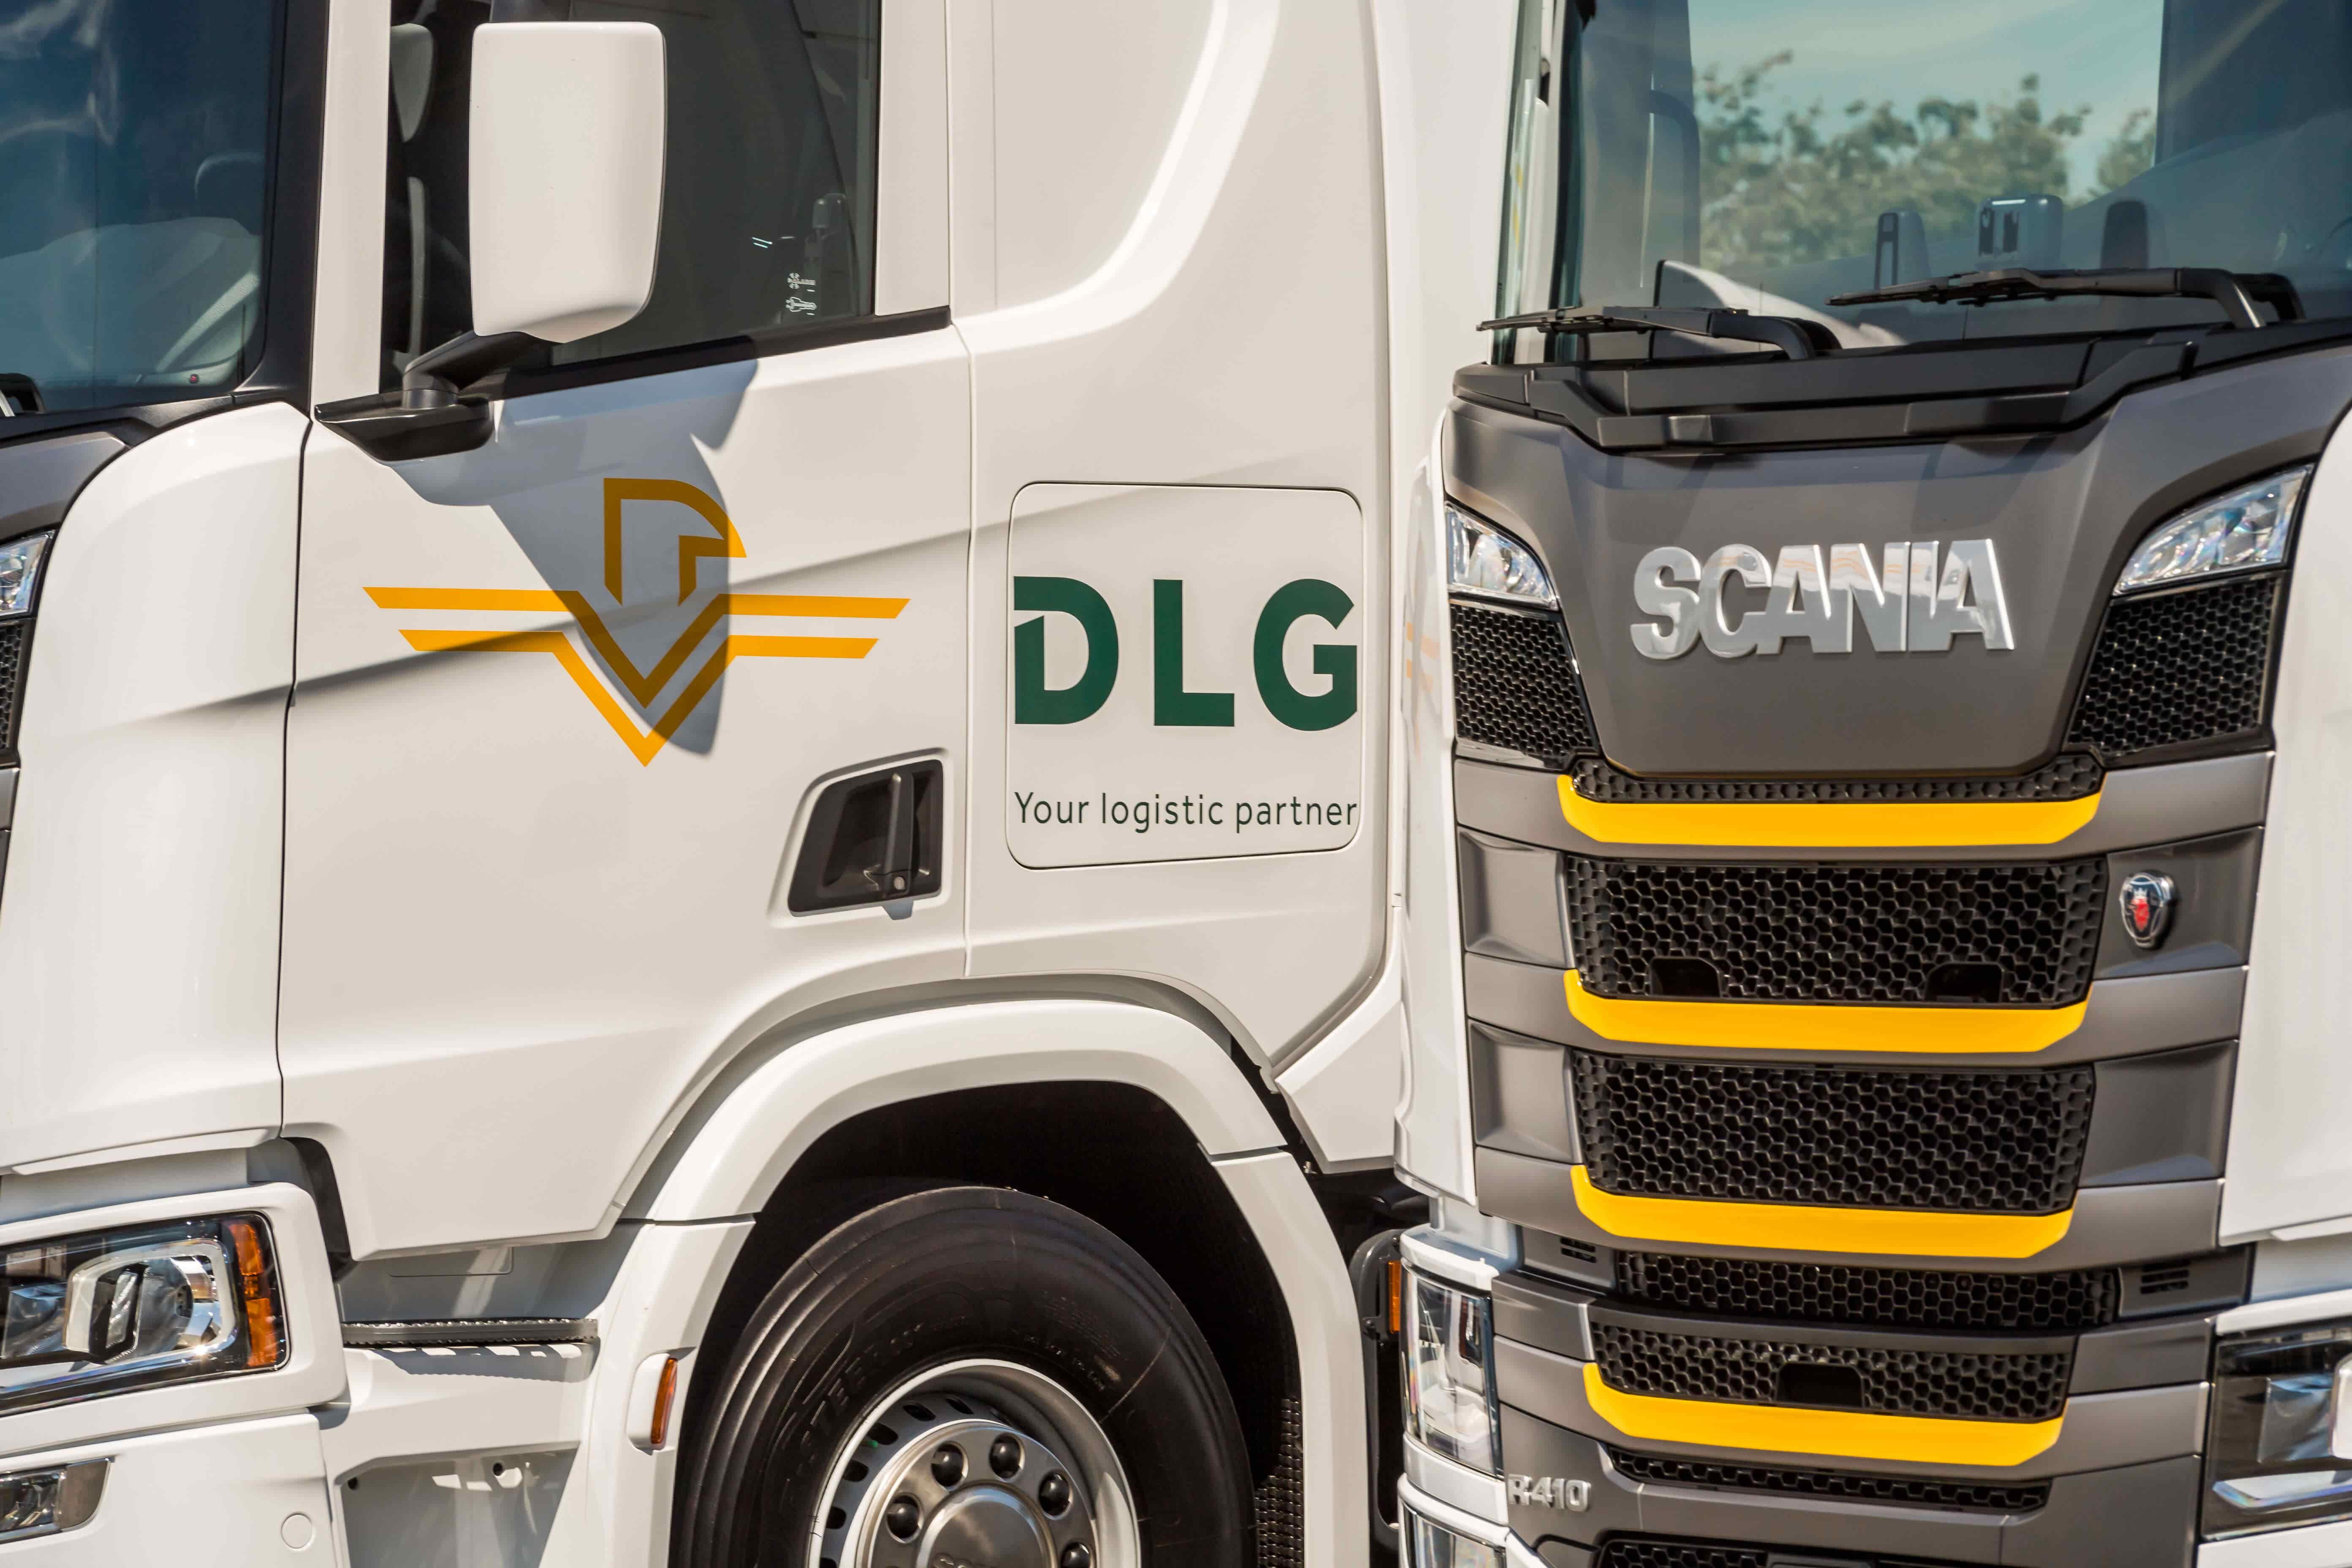 DLG supply chain logistiek